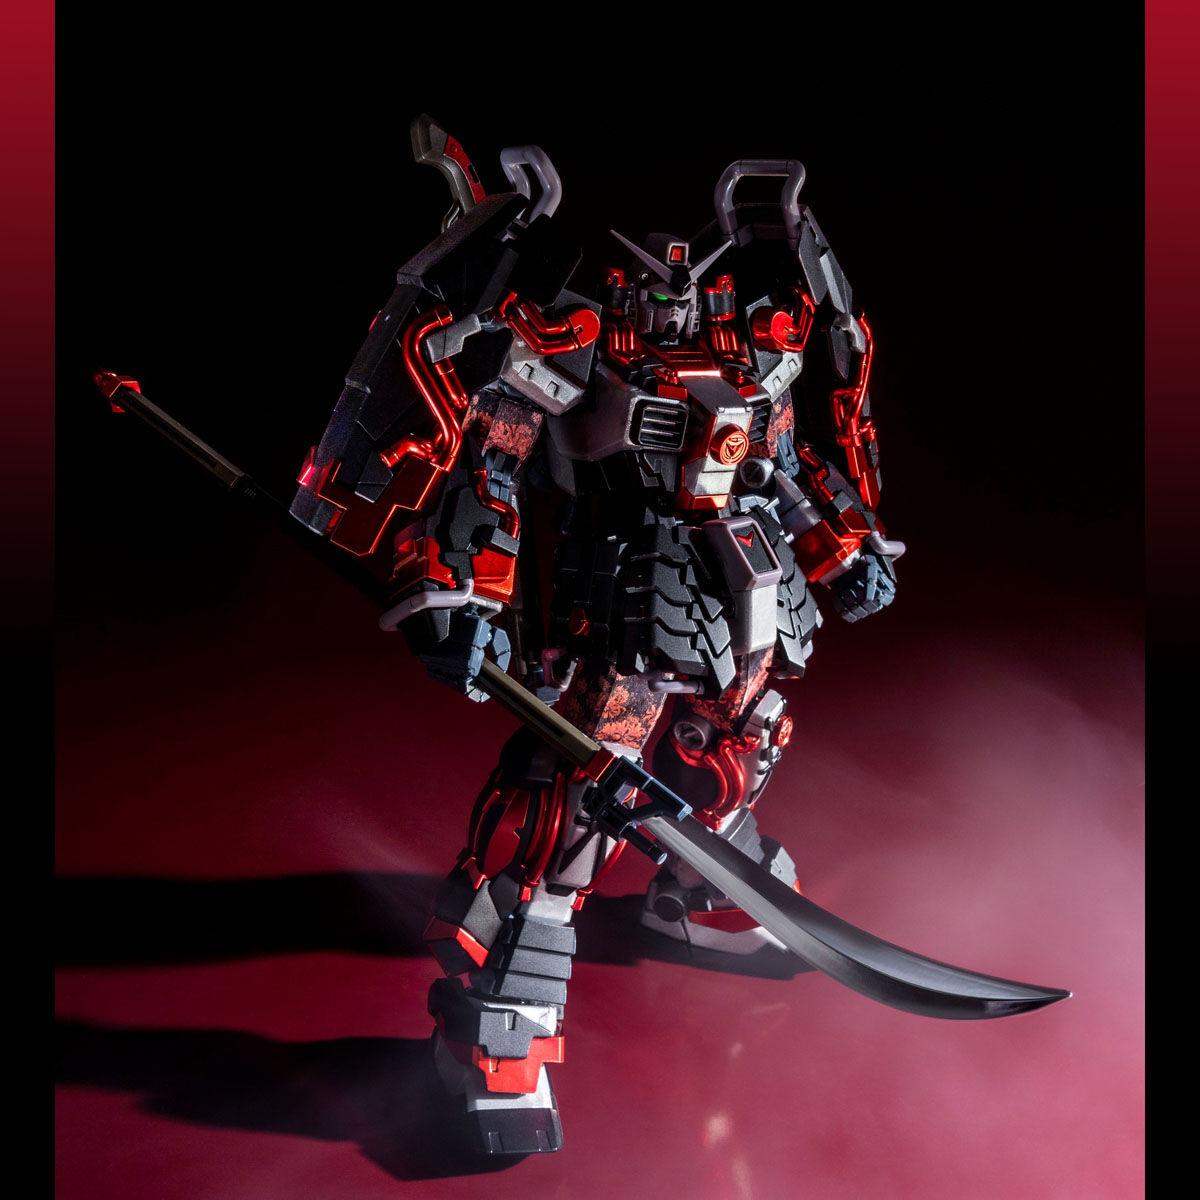 MG 1/100 SHIN MUSHA GUNDAM SENGOKU NO JIN BLACK ROBE LARGE ARMOR [Feb 2022 Delivery]